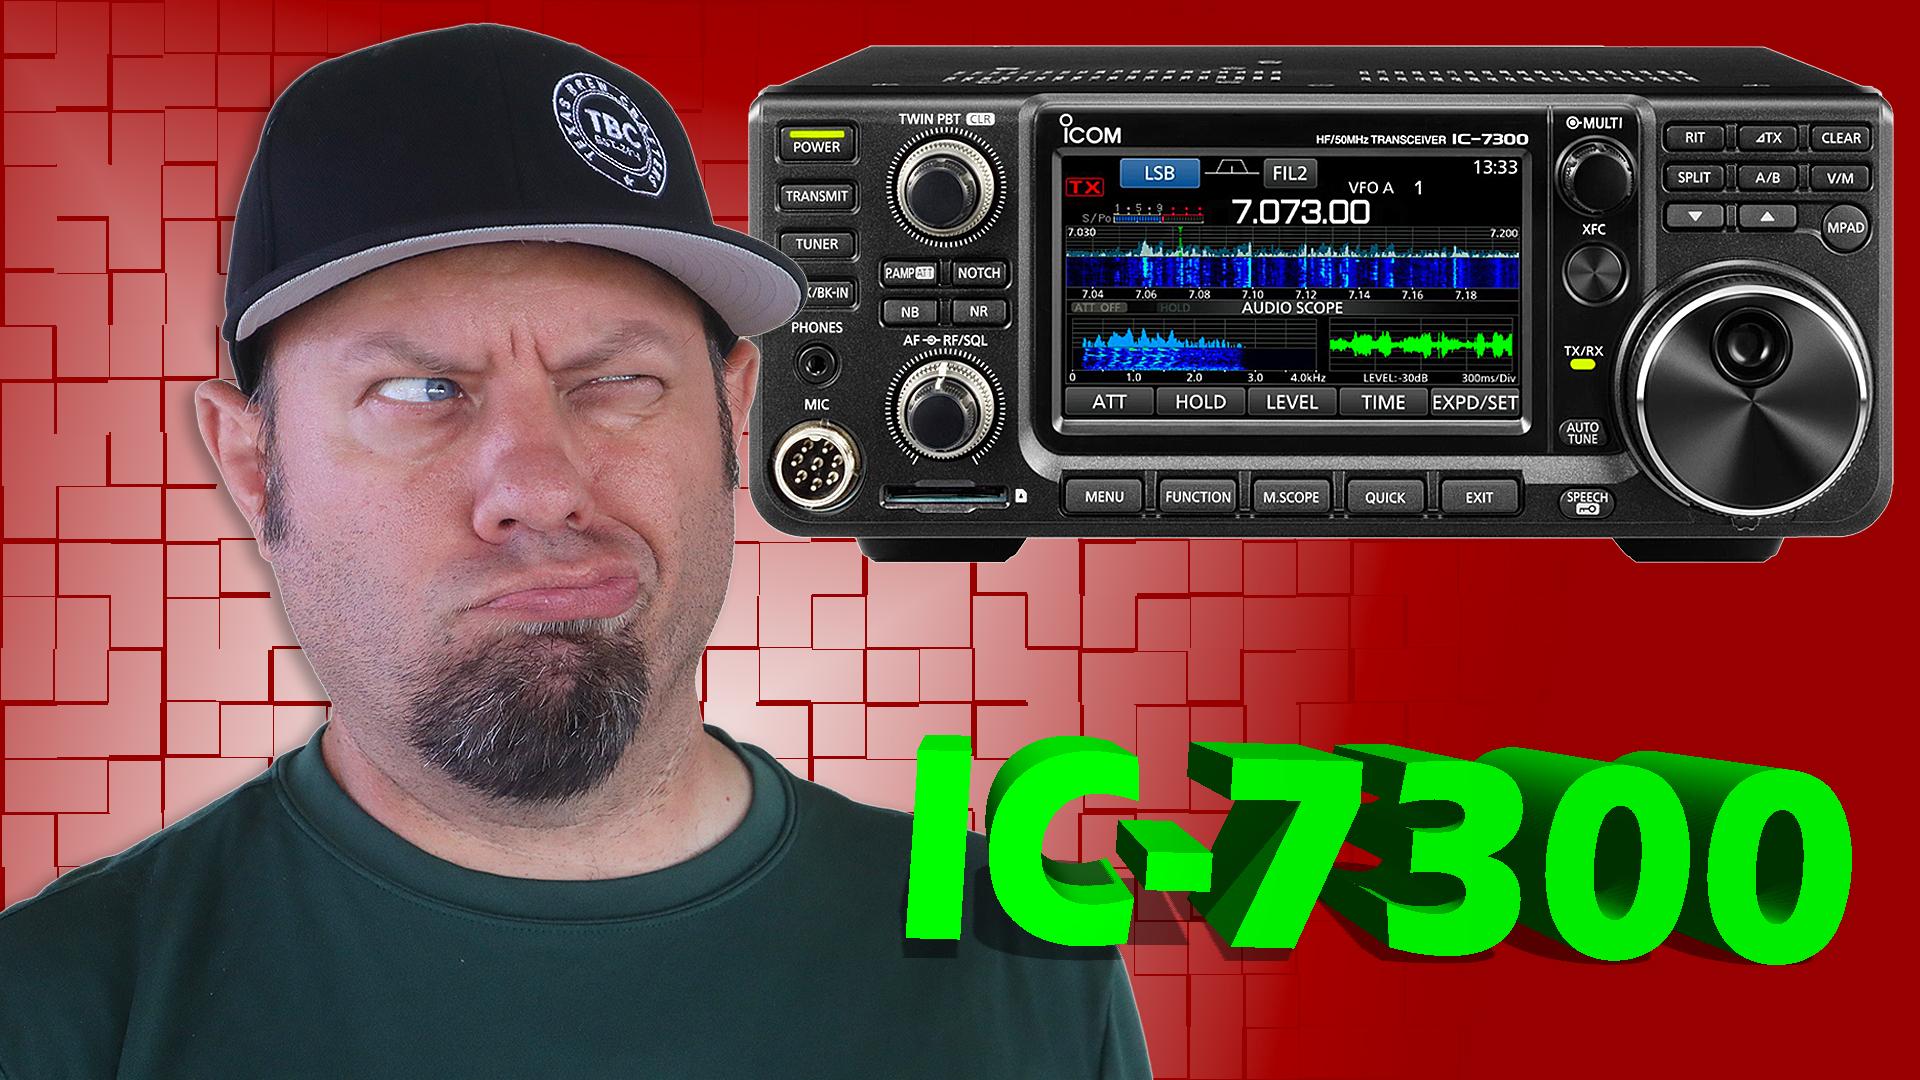 Episode 468: Re-Unboxing the Icom IC-7300 – IC-7300 Setup and Usage